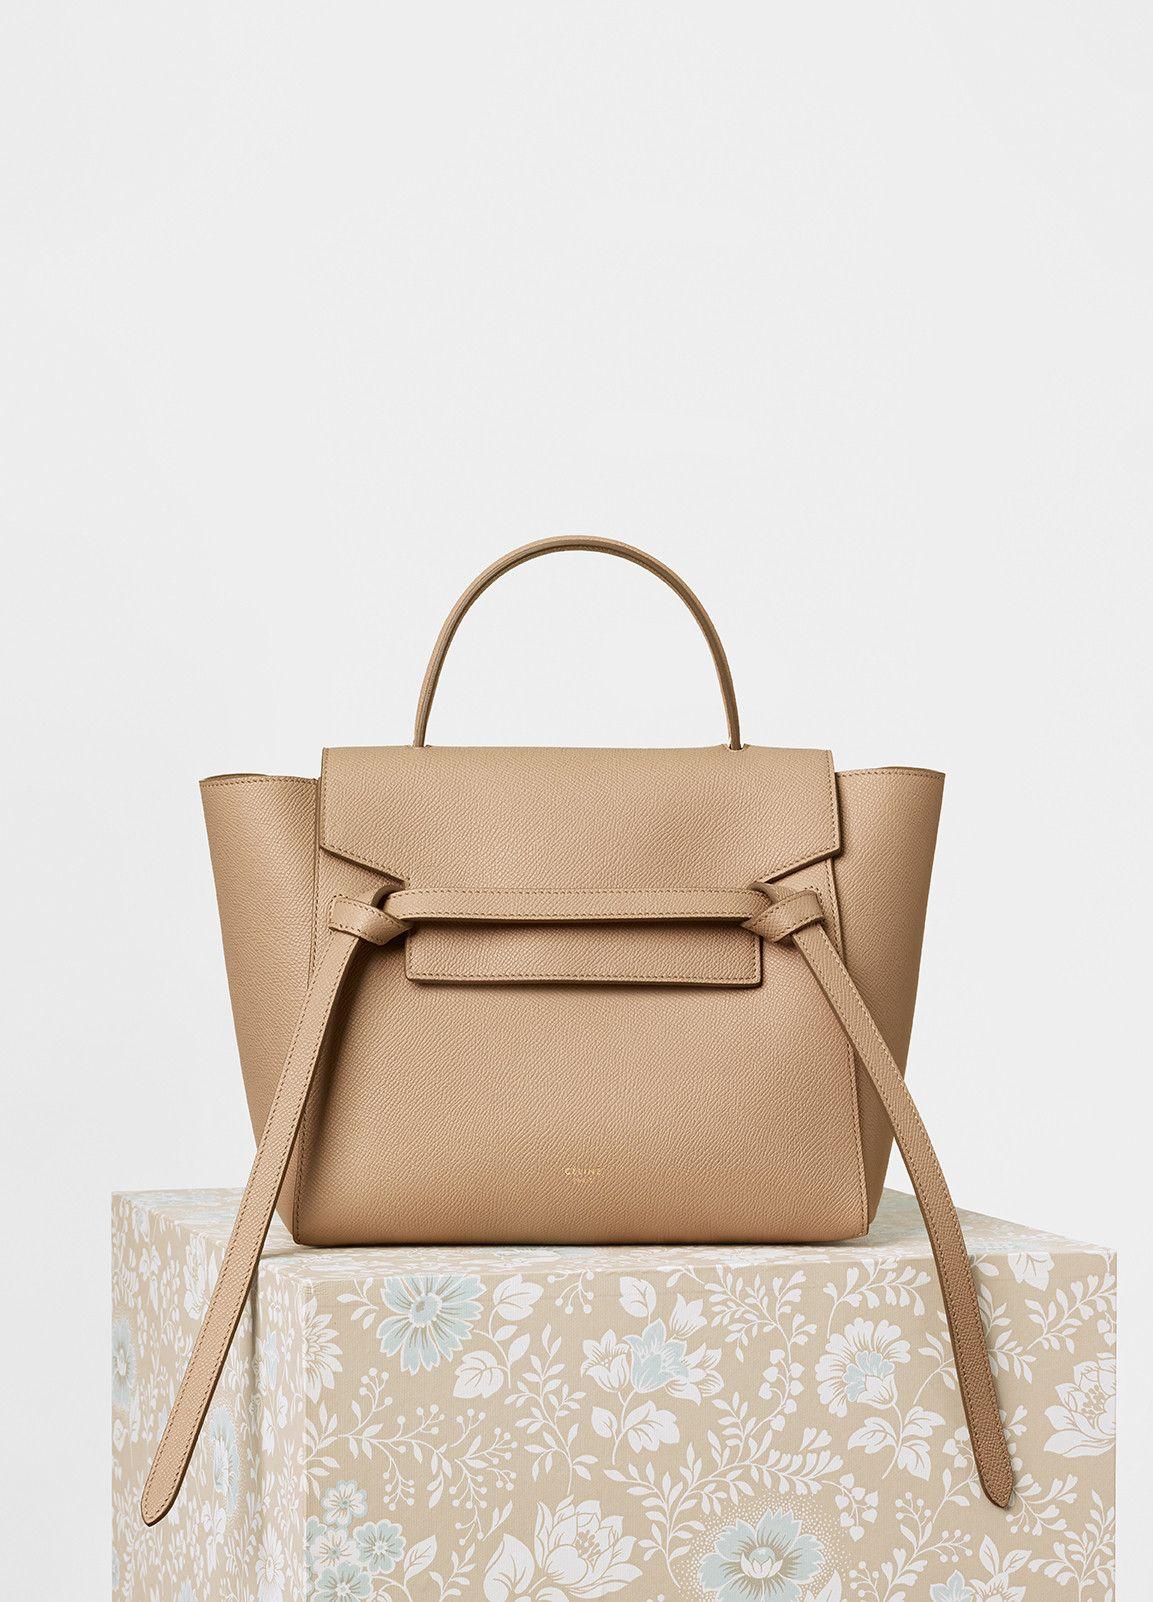 e4e0bf96f39a Micro Belt Handbag in Grained Calfskin - Céline